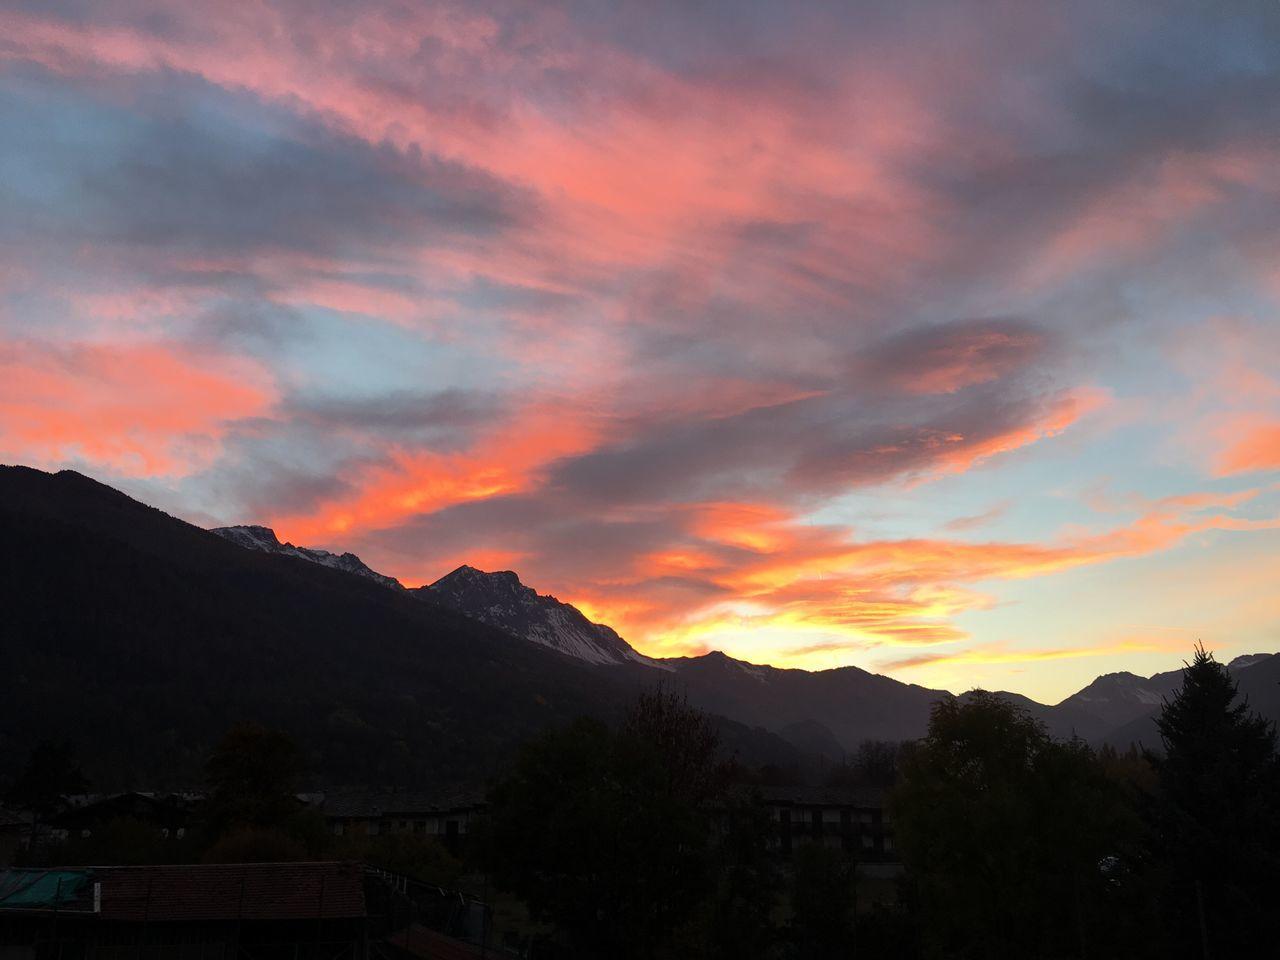 Oulx Italy Alps Mountains Sky Cloud Perfect Magic Sunset Landscape Skyline Nature Autumn Colourful